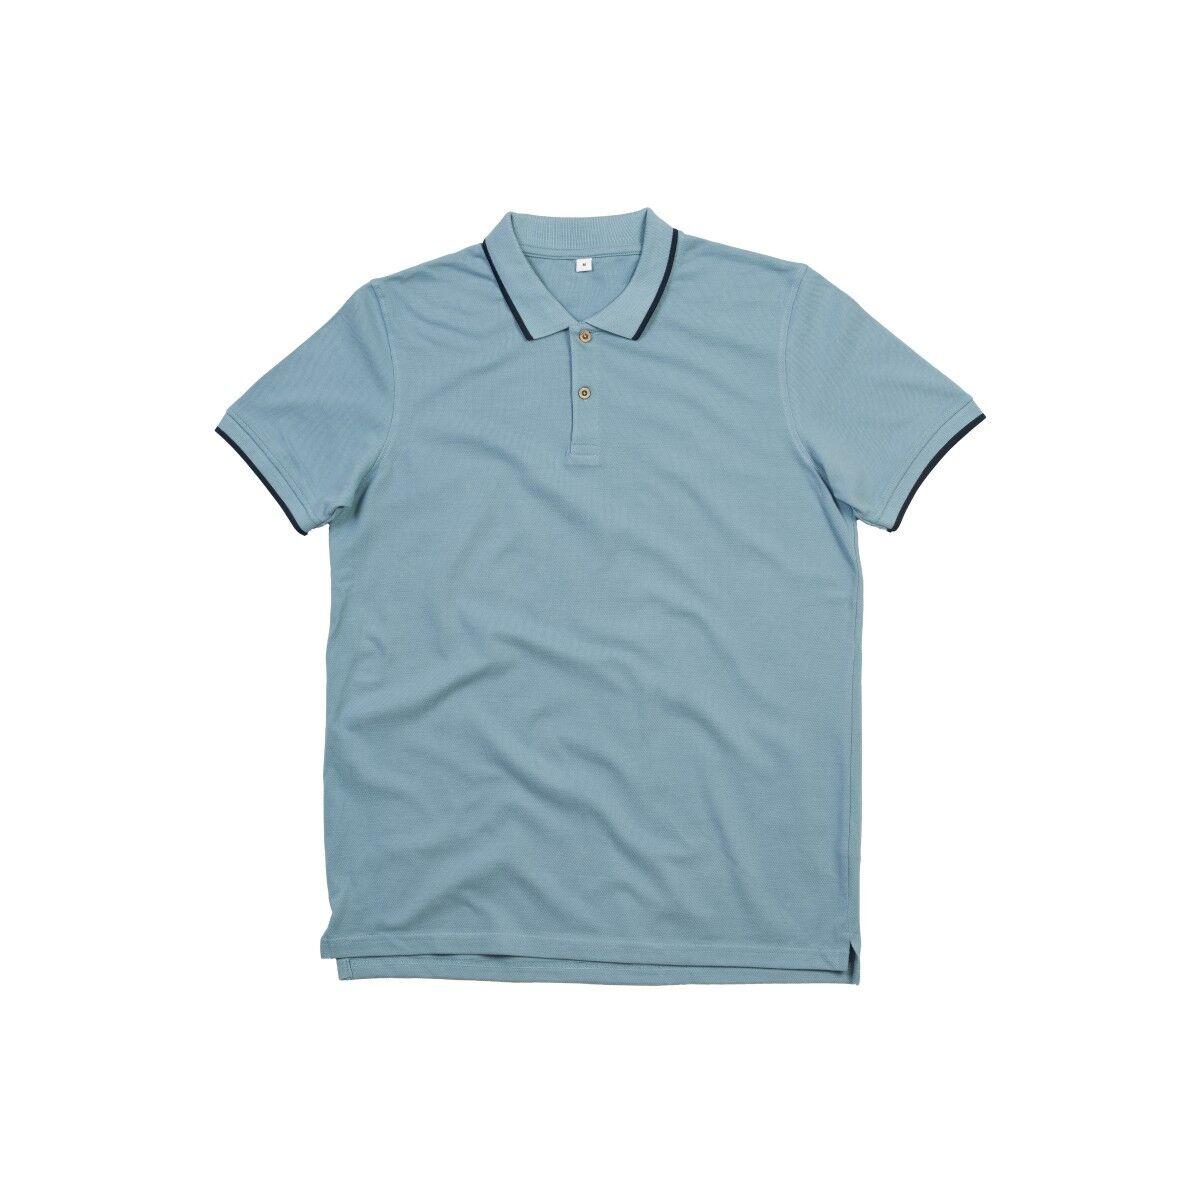 Mantis Tipped Polo Shirt -  Light Denim & Navy